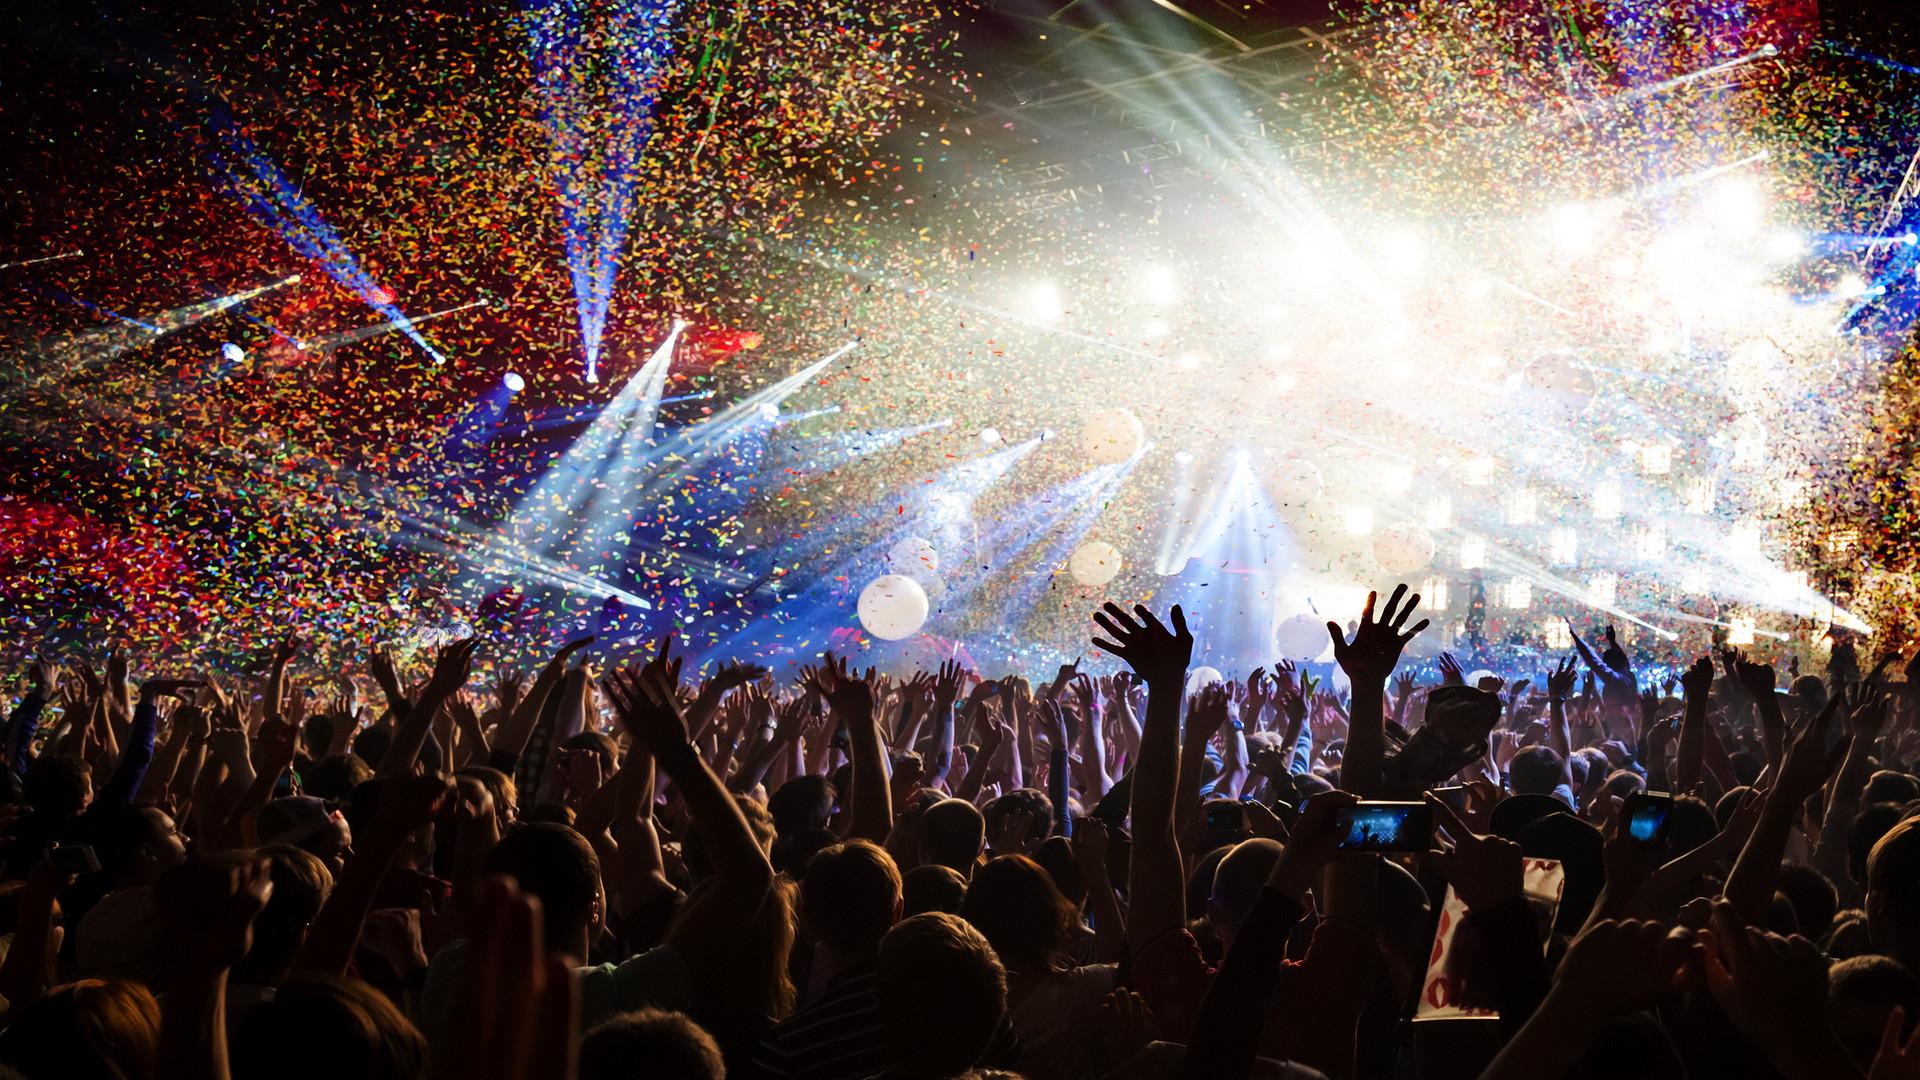 DJ Khaled, Snapchat, and Spontaneity in Videos